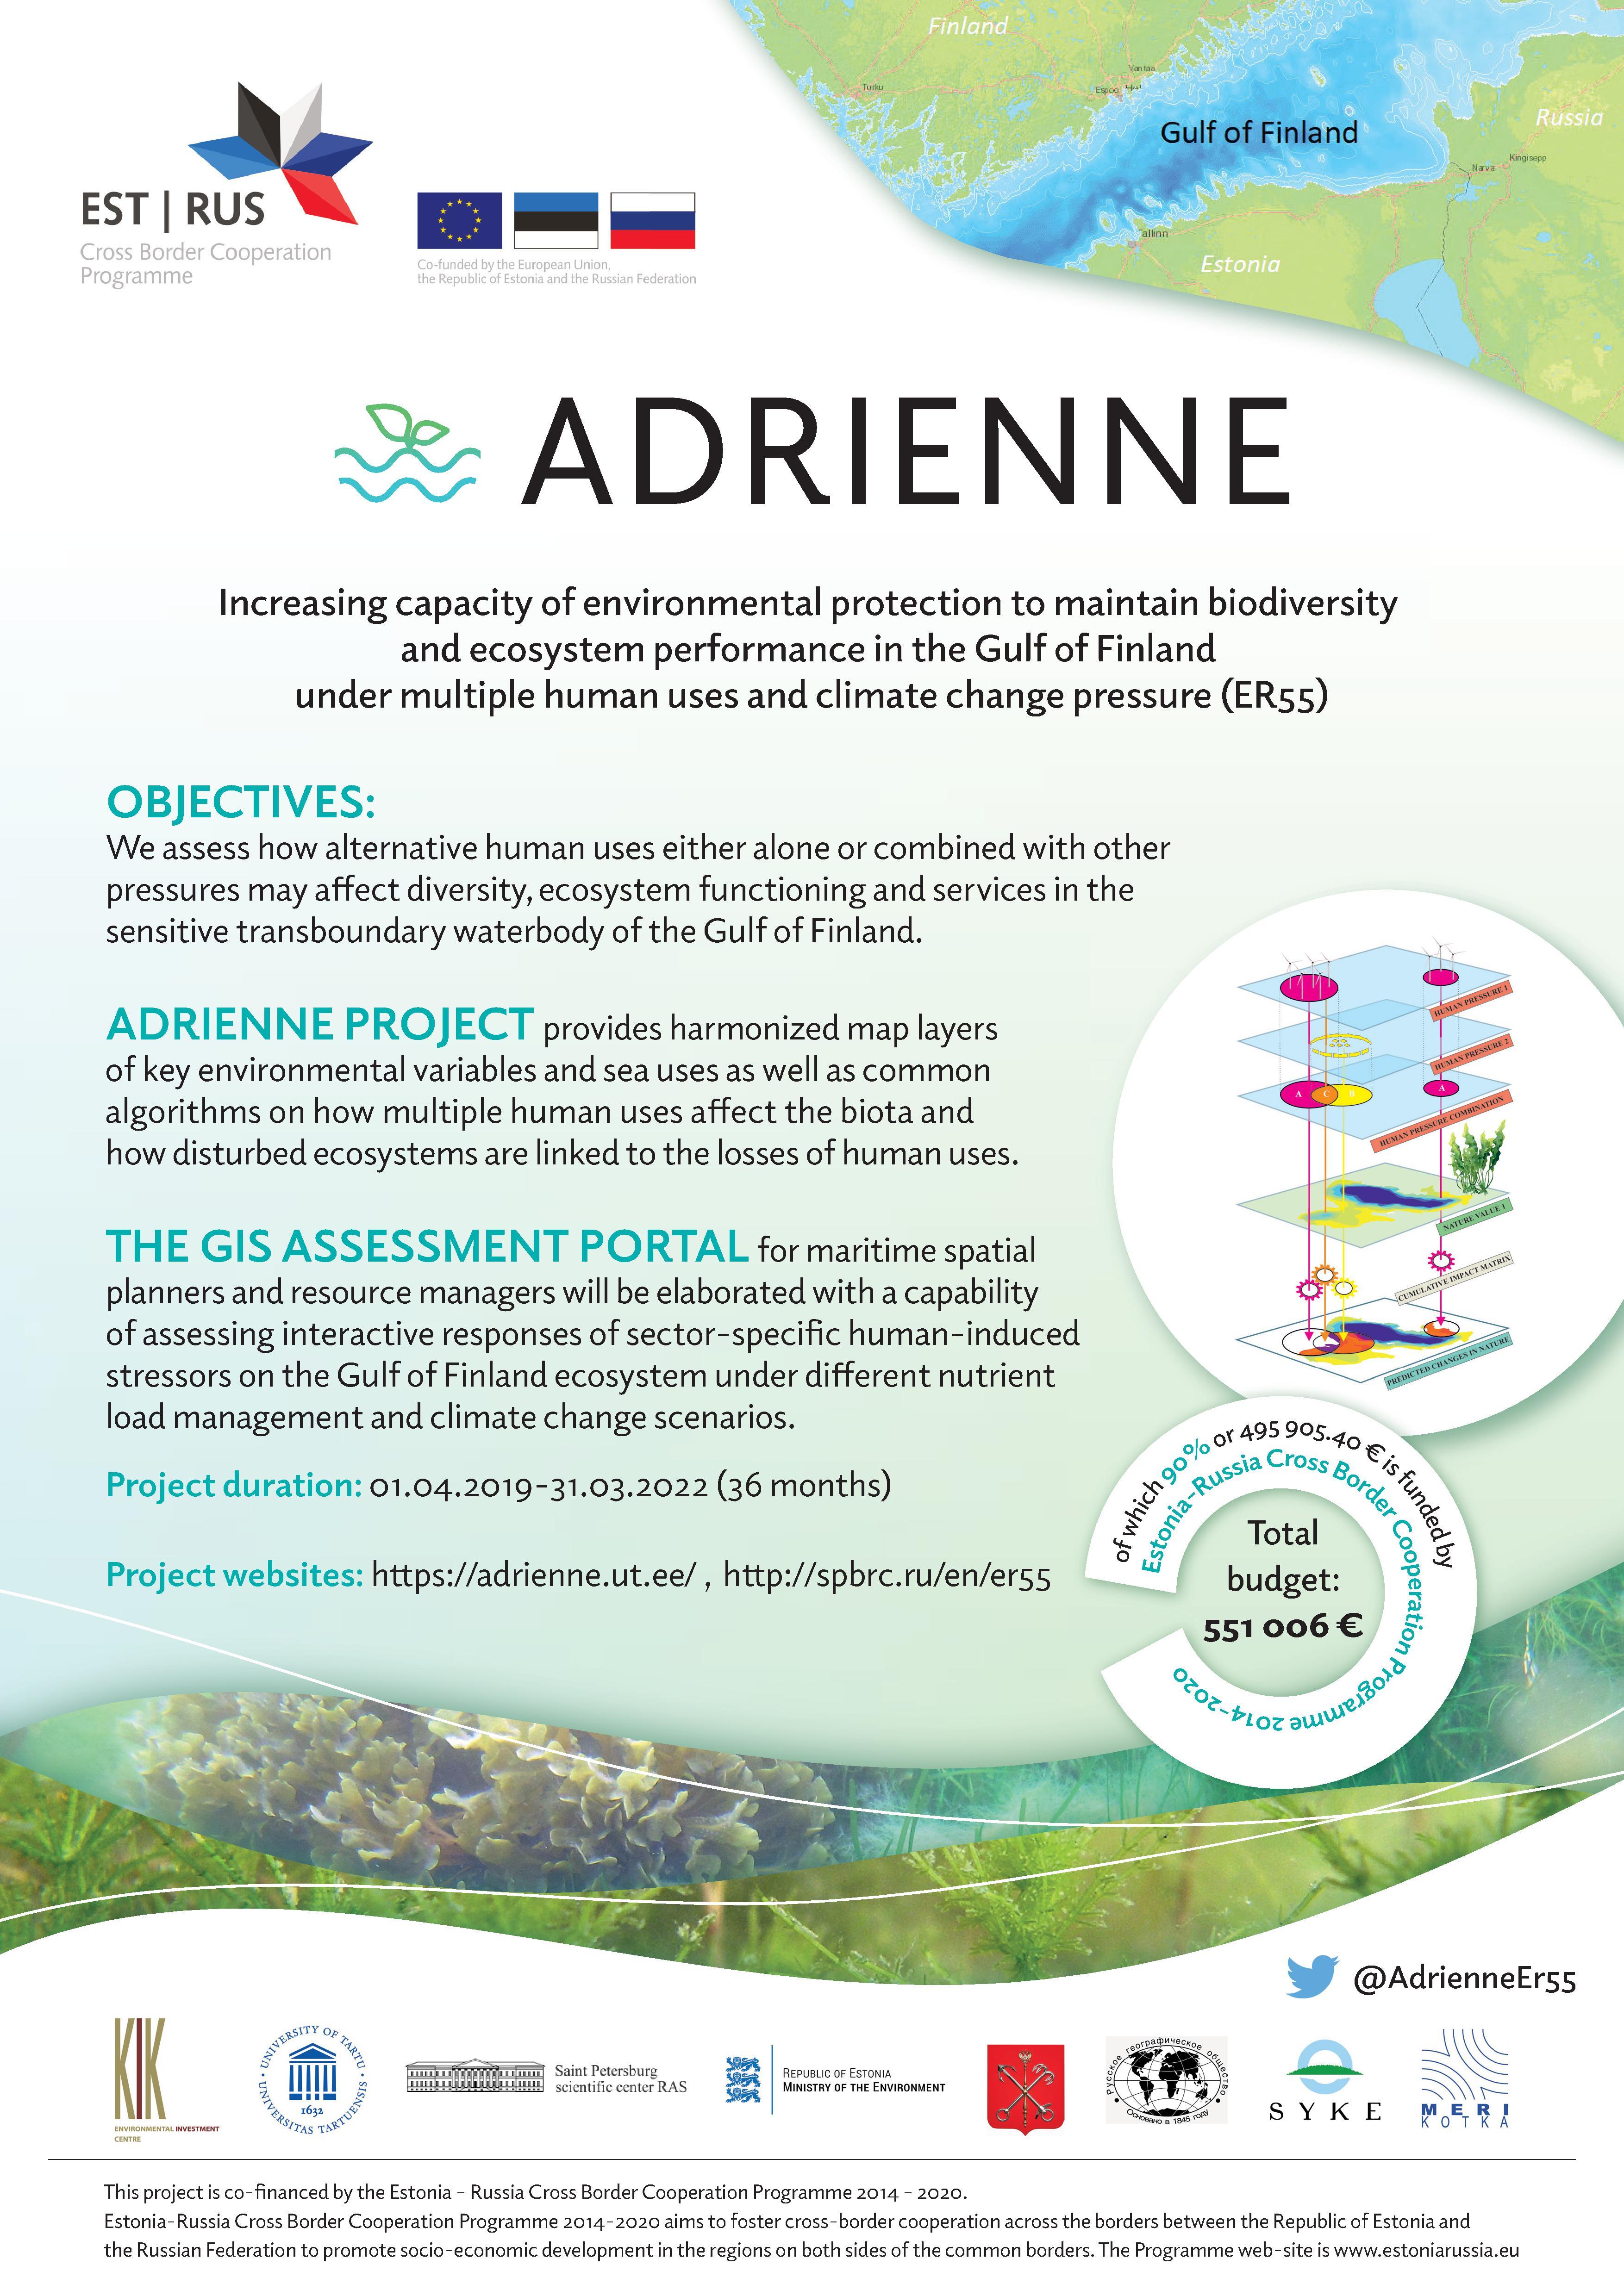 Adrienne poster